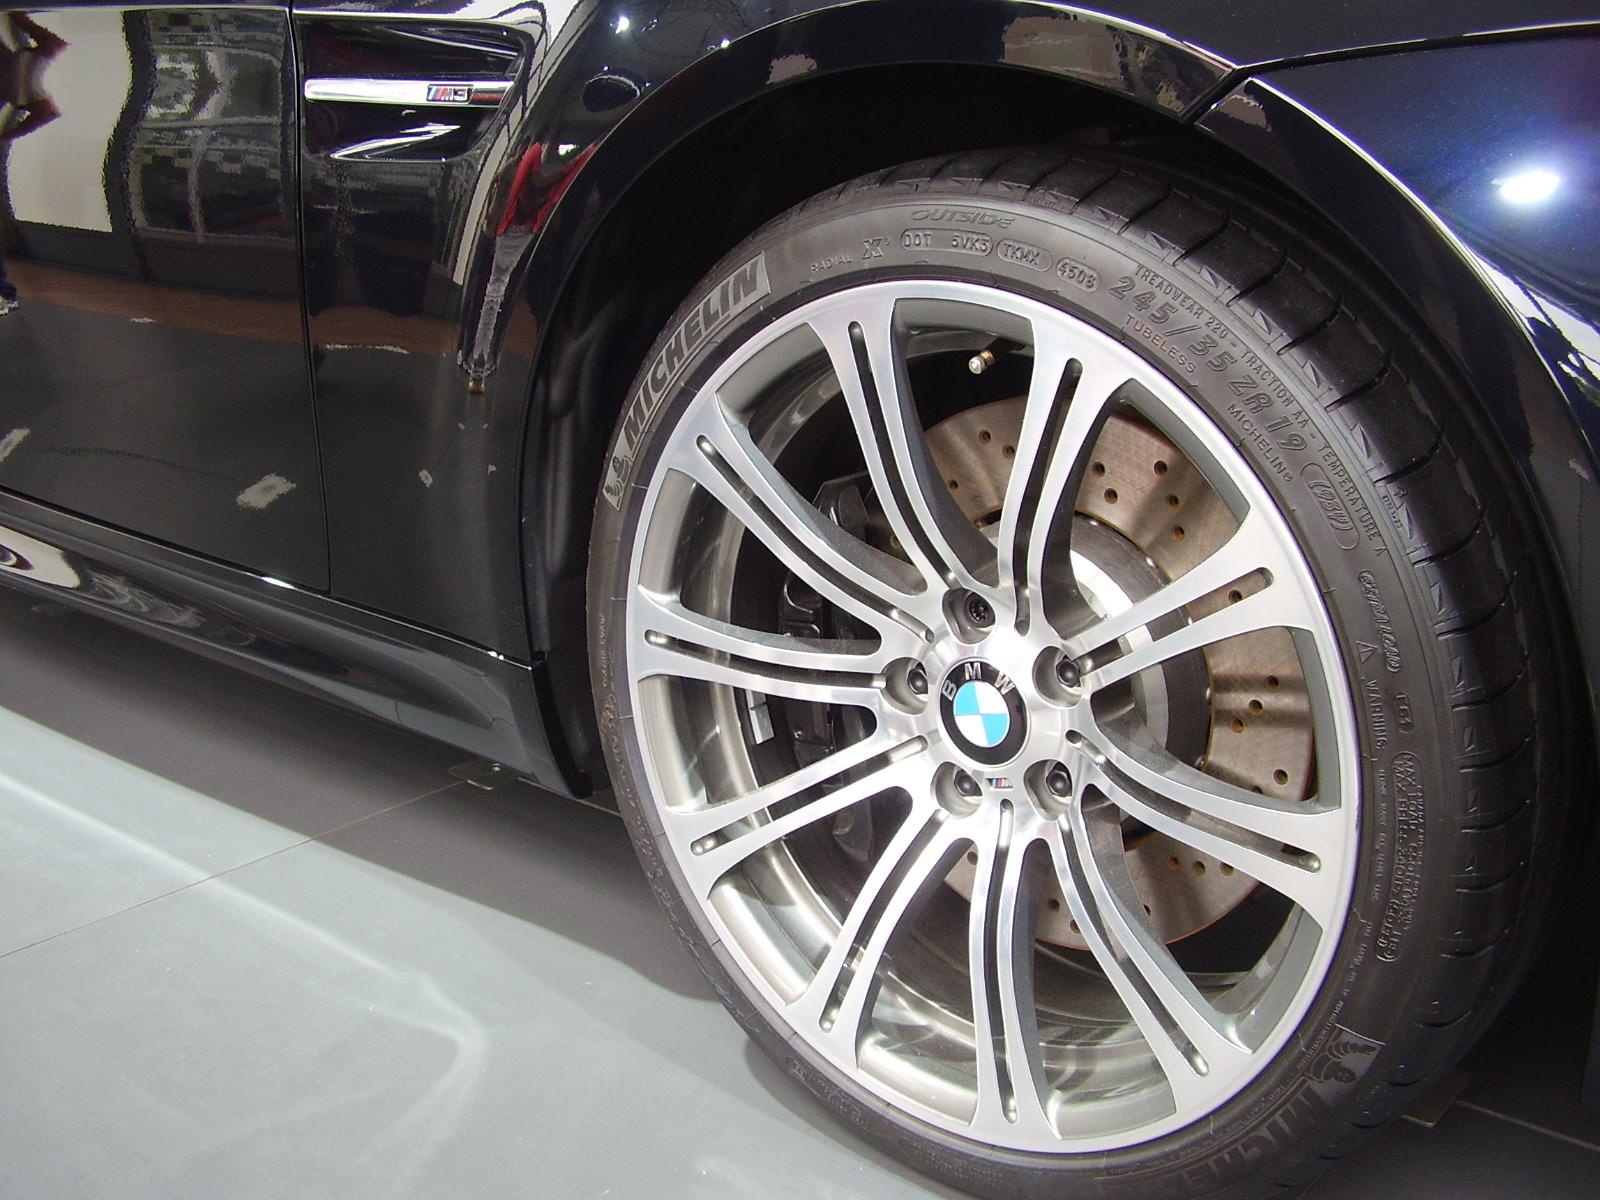 Visita Salon Automovil 09 BCN / Visit to Car Exhibition 09 Barcelona-P5140790.JPG